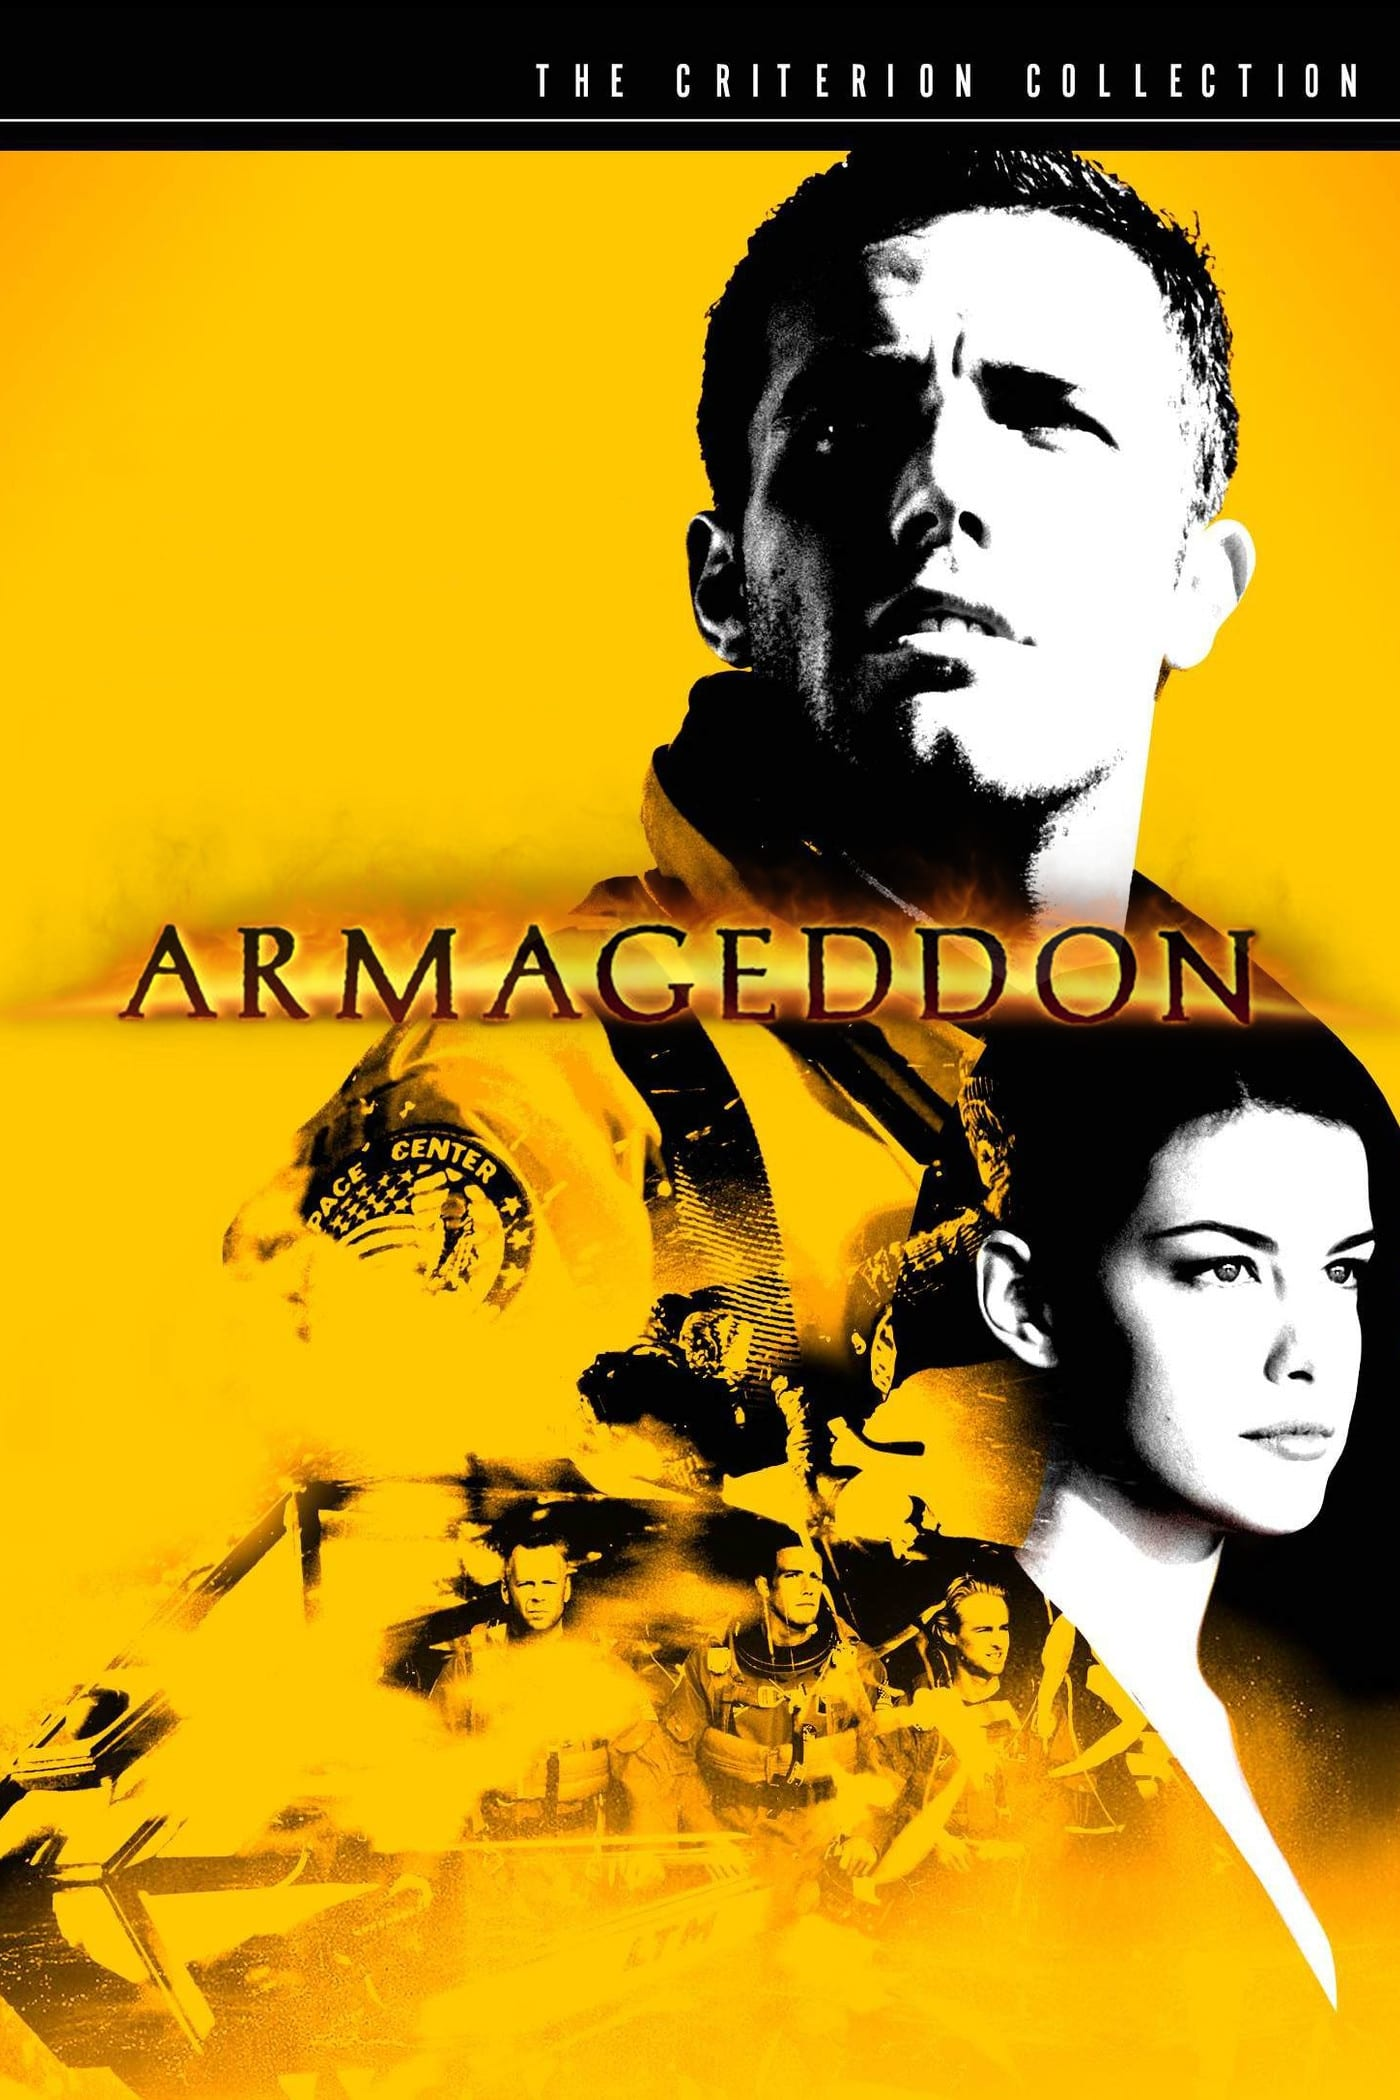 armageddon movie poster - HD1400×2100